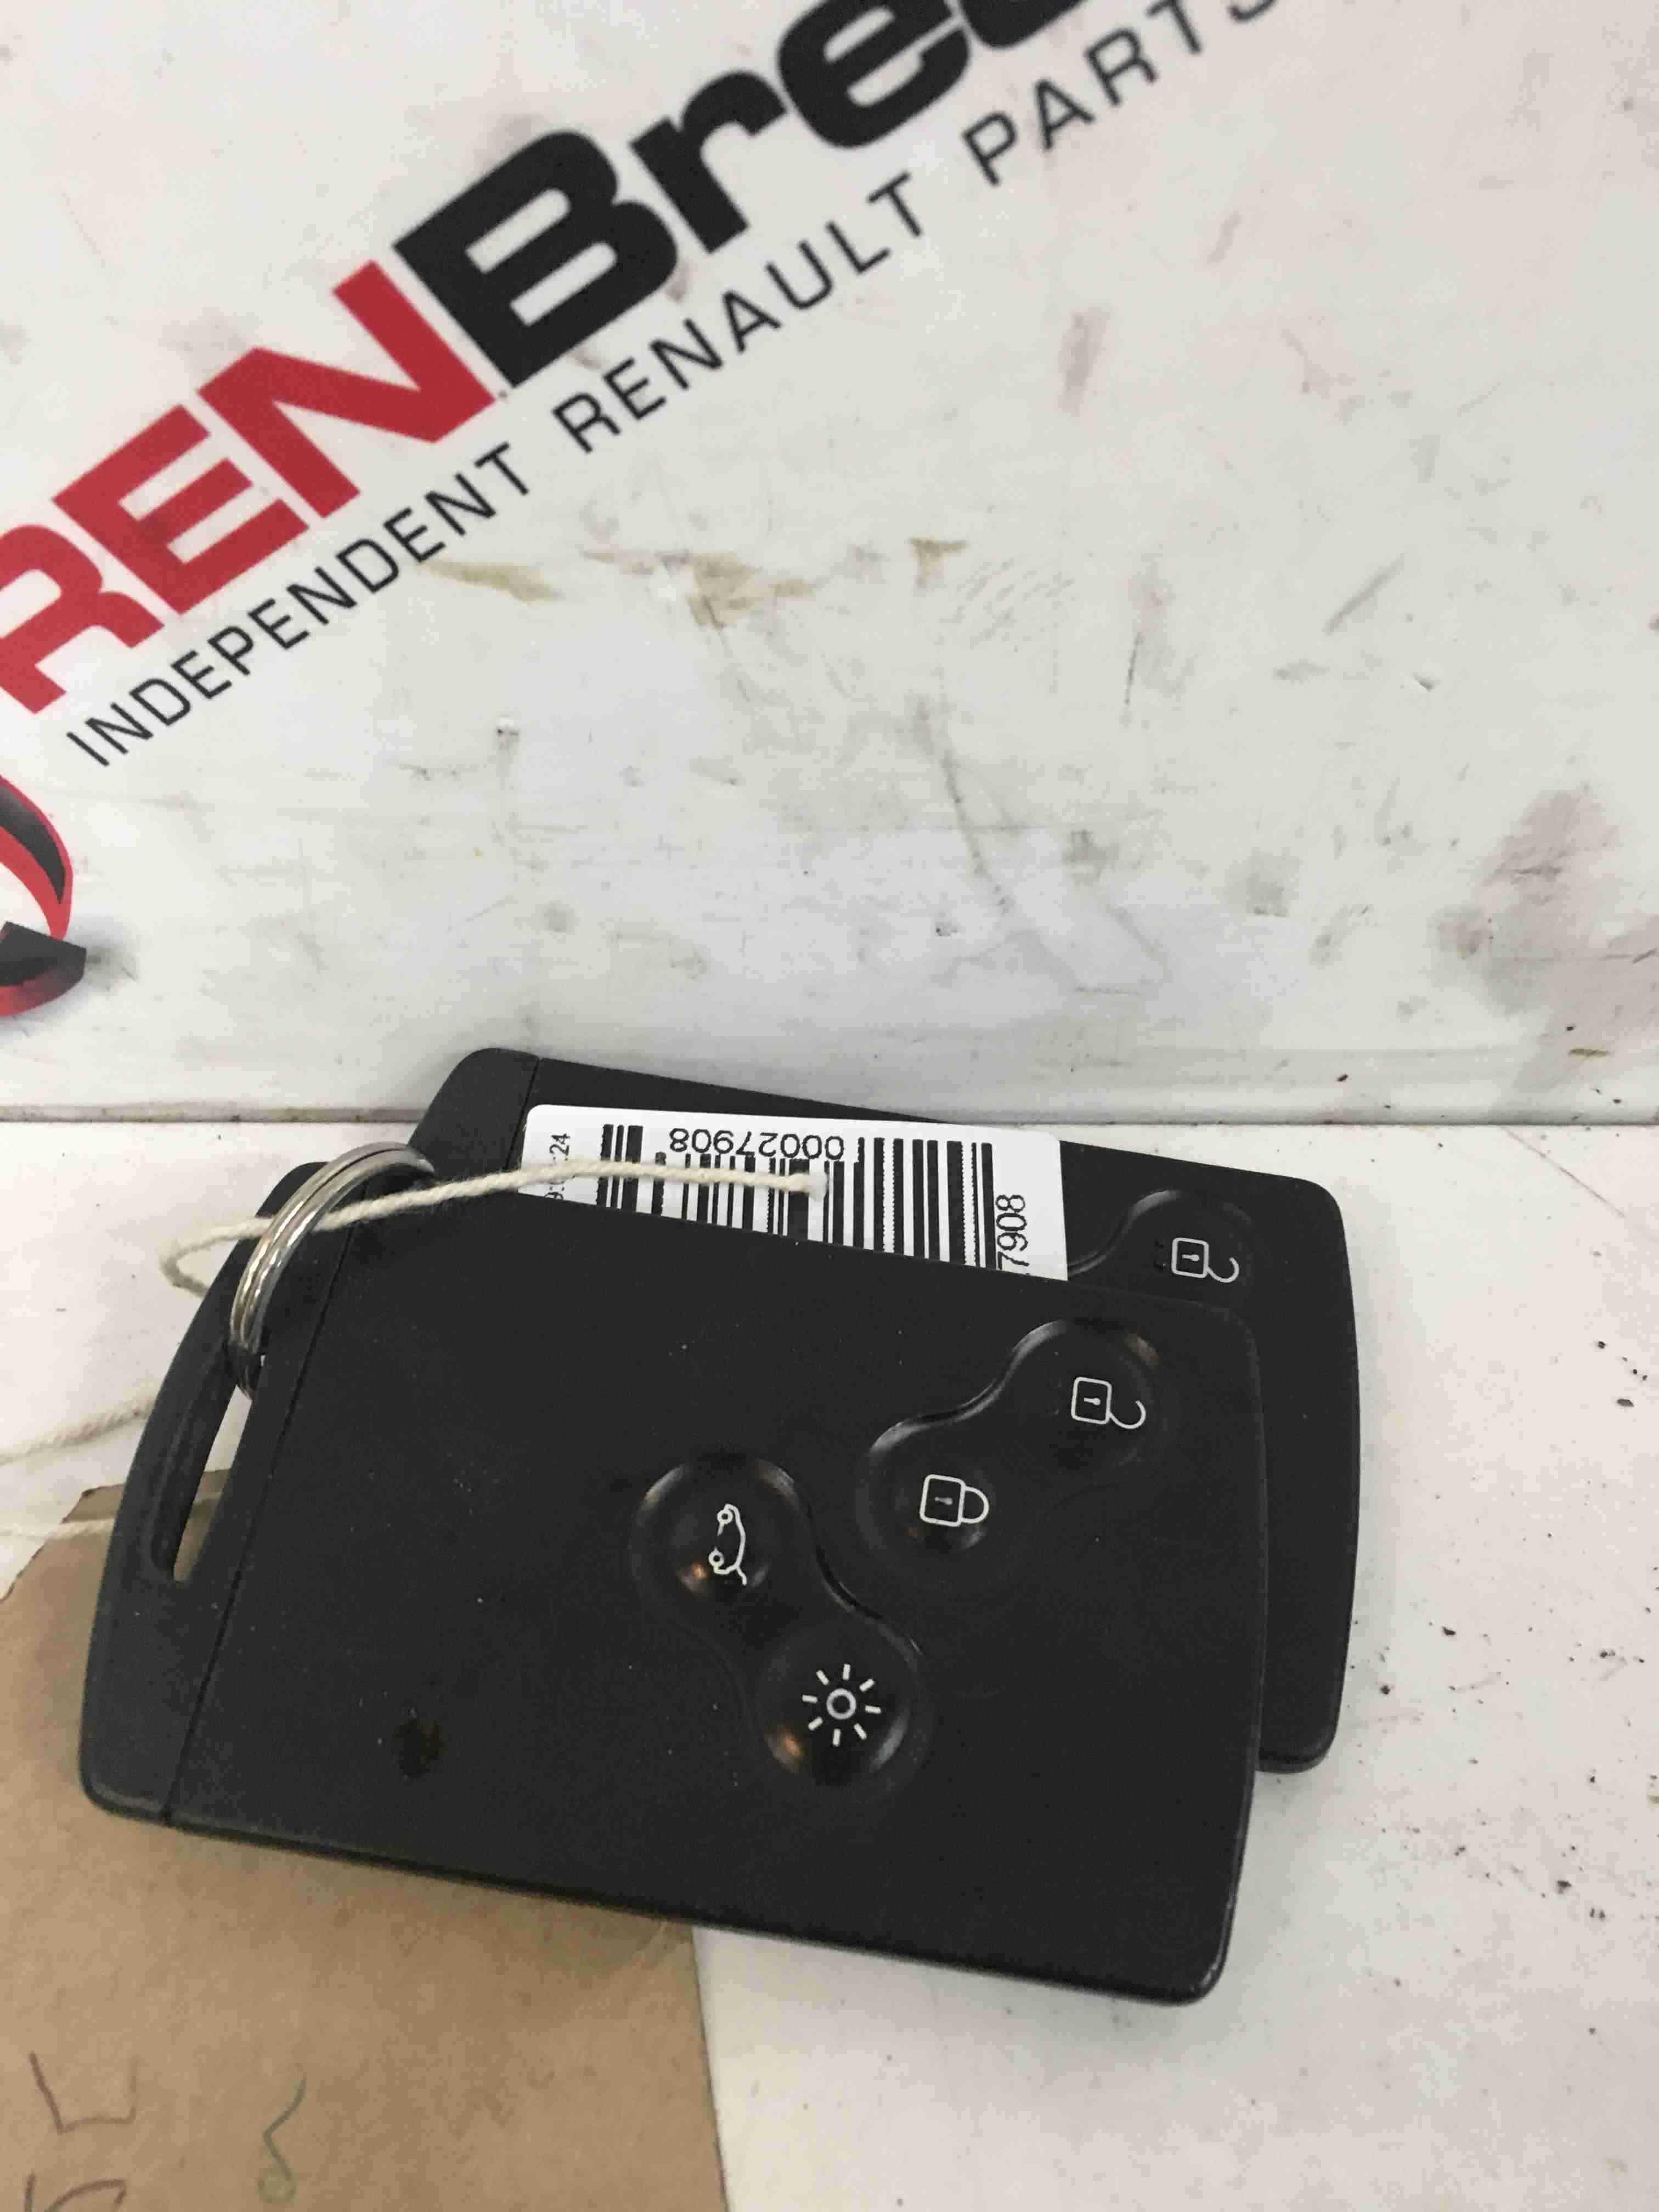 Renault Laguna MK3 2007-2012 Replacement Key Card Case X2